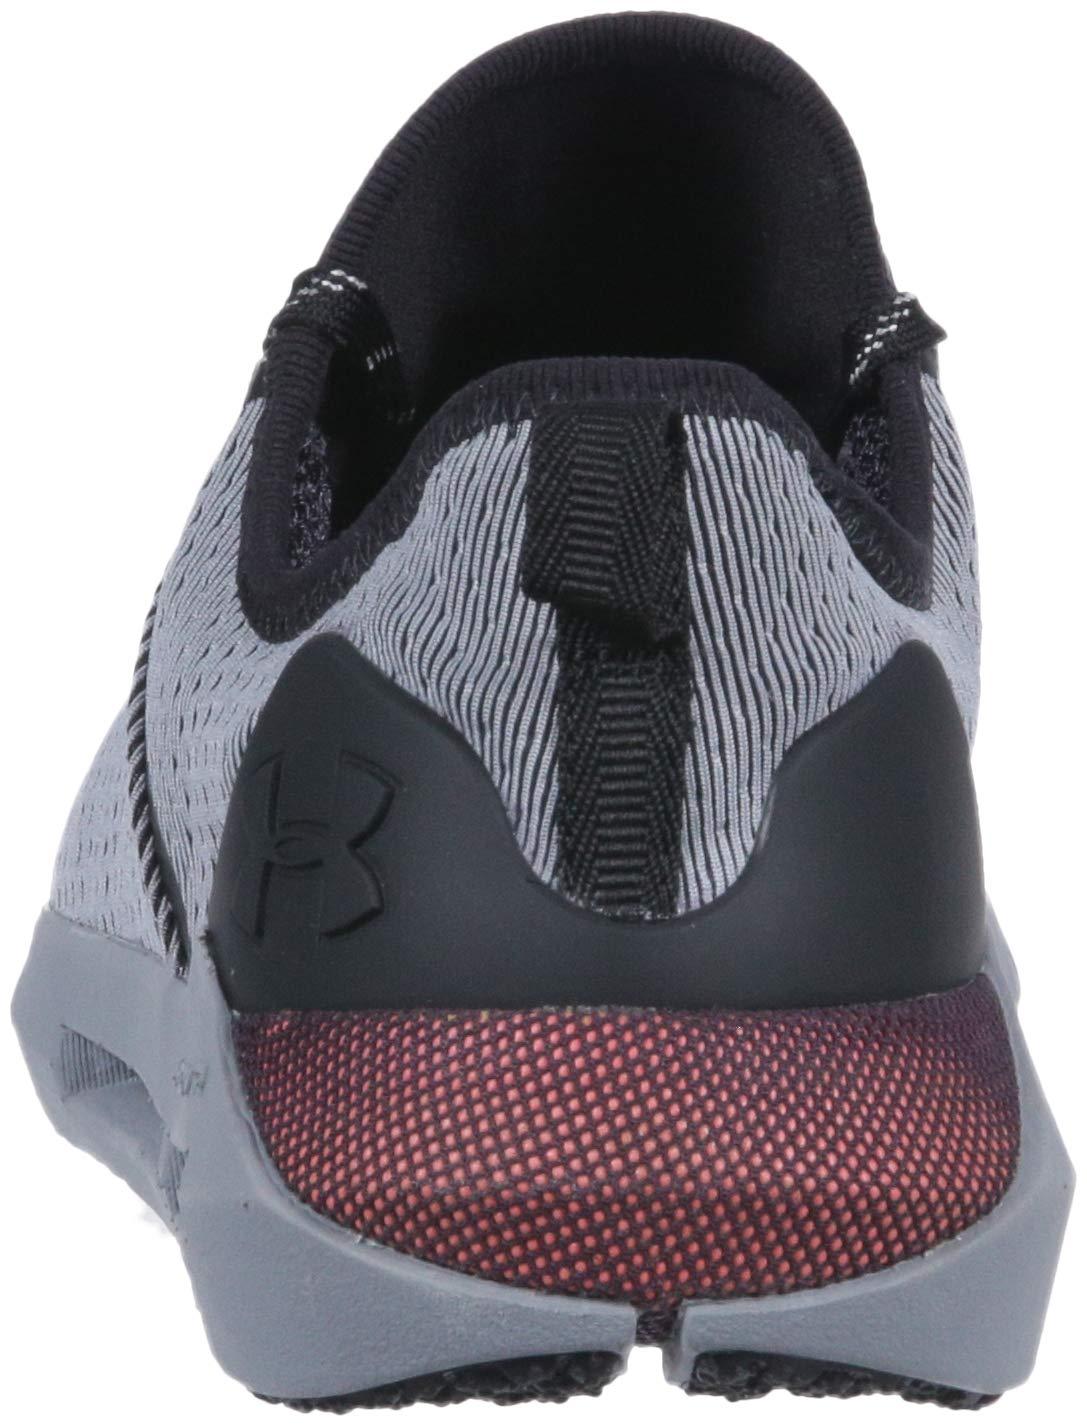 adidas Men's Questar BYD Running Shoe Black/Grey, 6.5 M US by adidas (Image #2)